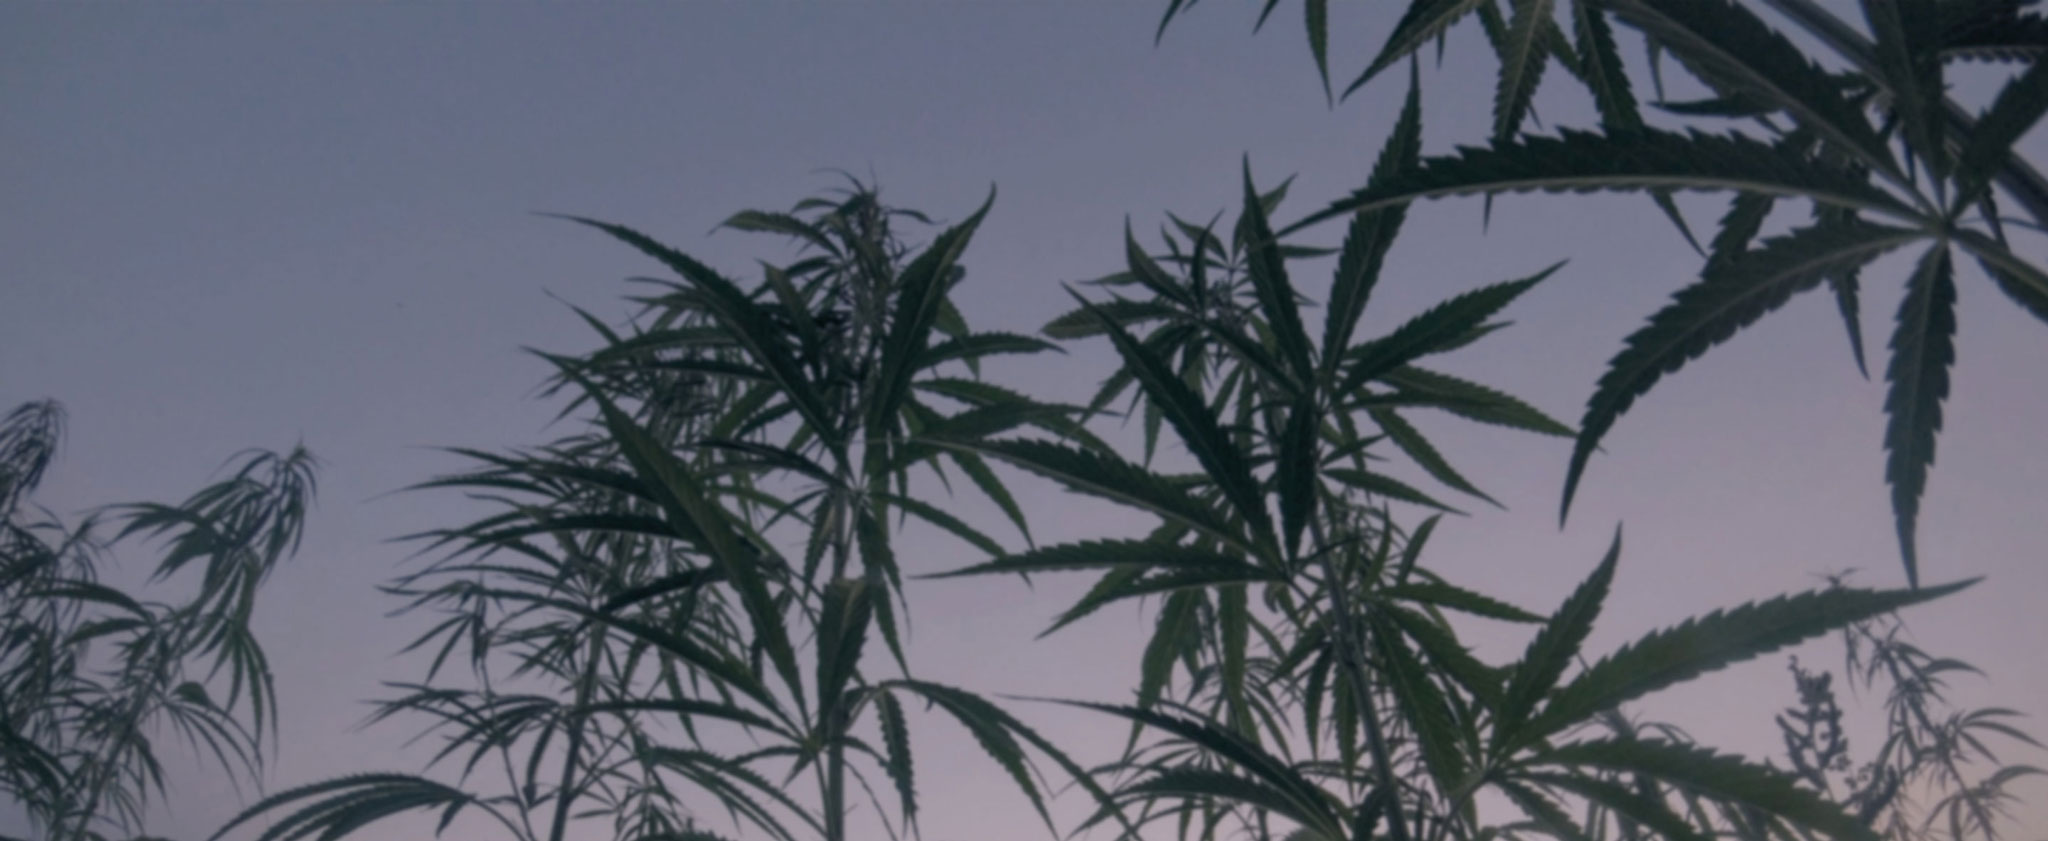 Hemp CBD plants at sunset